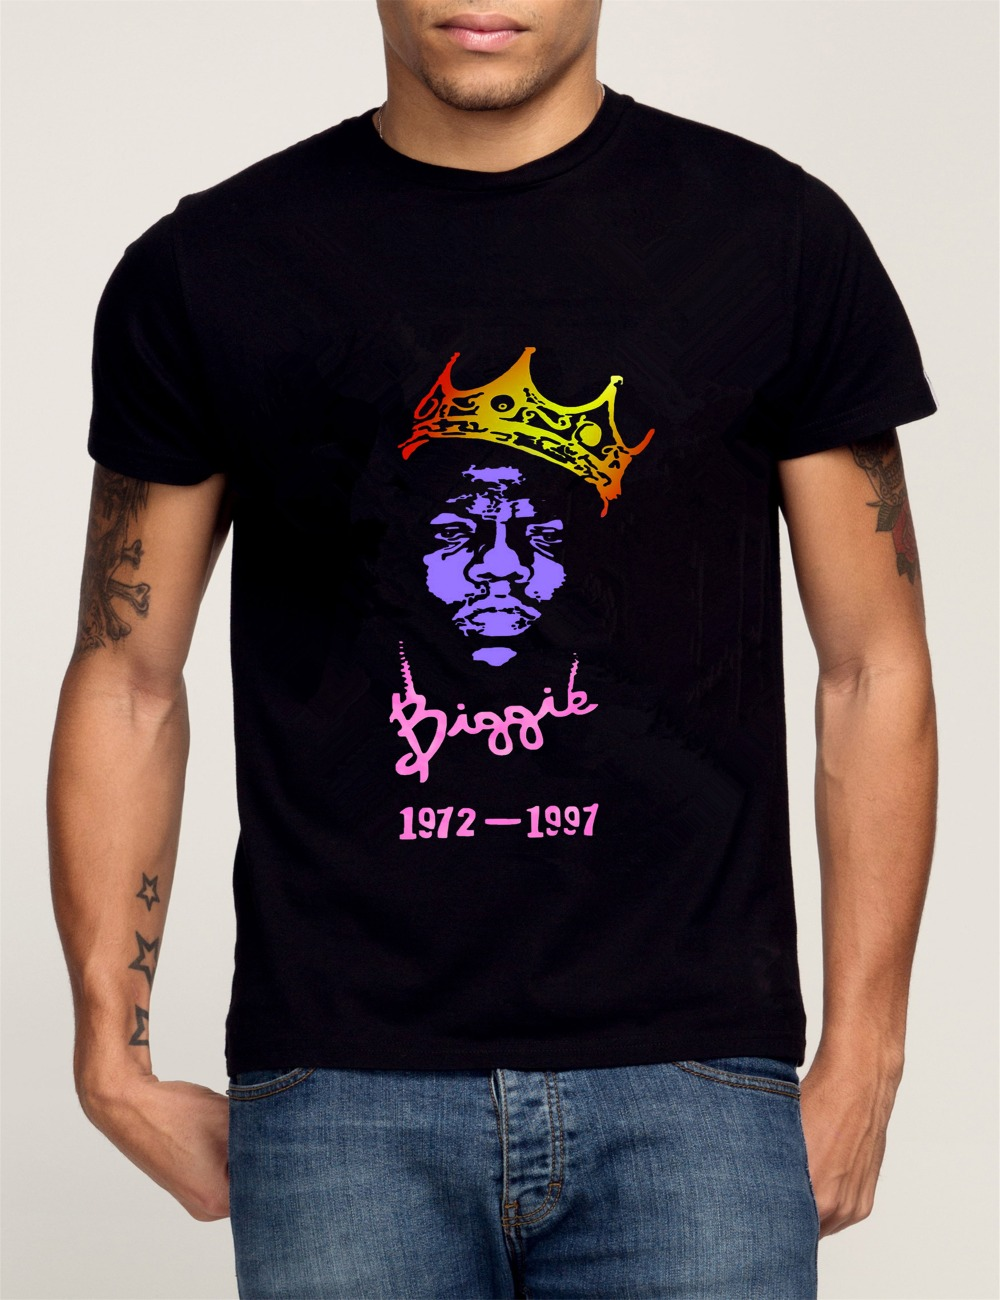 Biggie 2pac 2015 new diy fashion 100 cotton printed o for Diy tee shirt printing